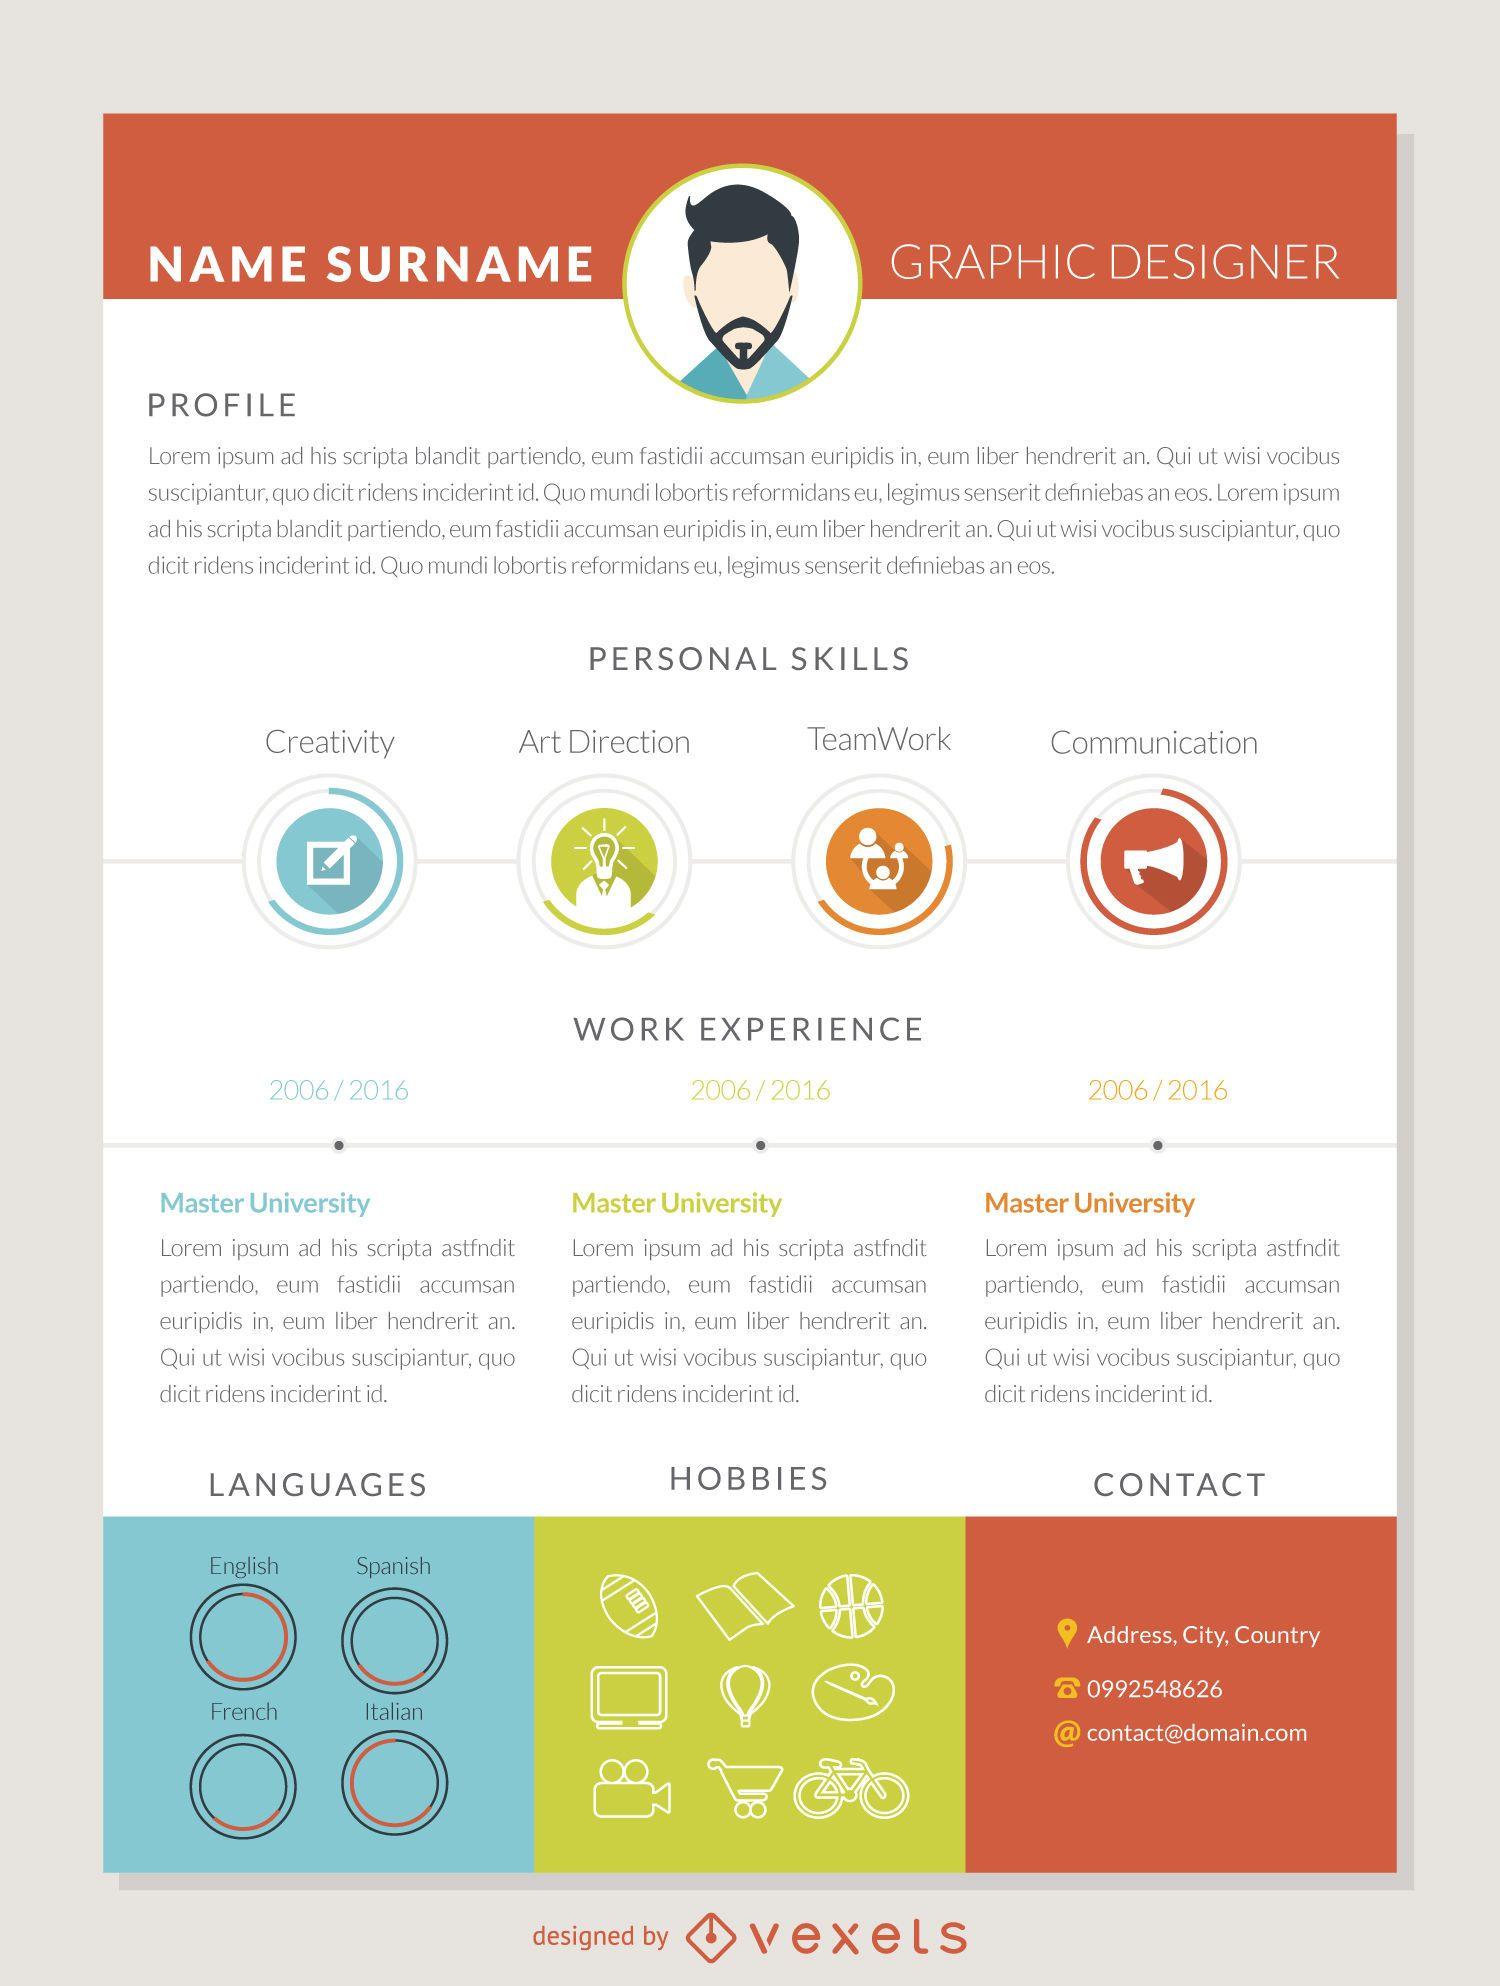 Graphic Designer Curriculum Mockup Template Vector Download